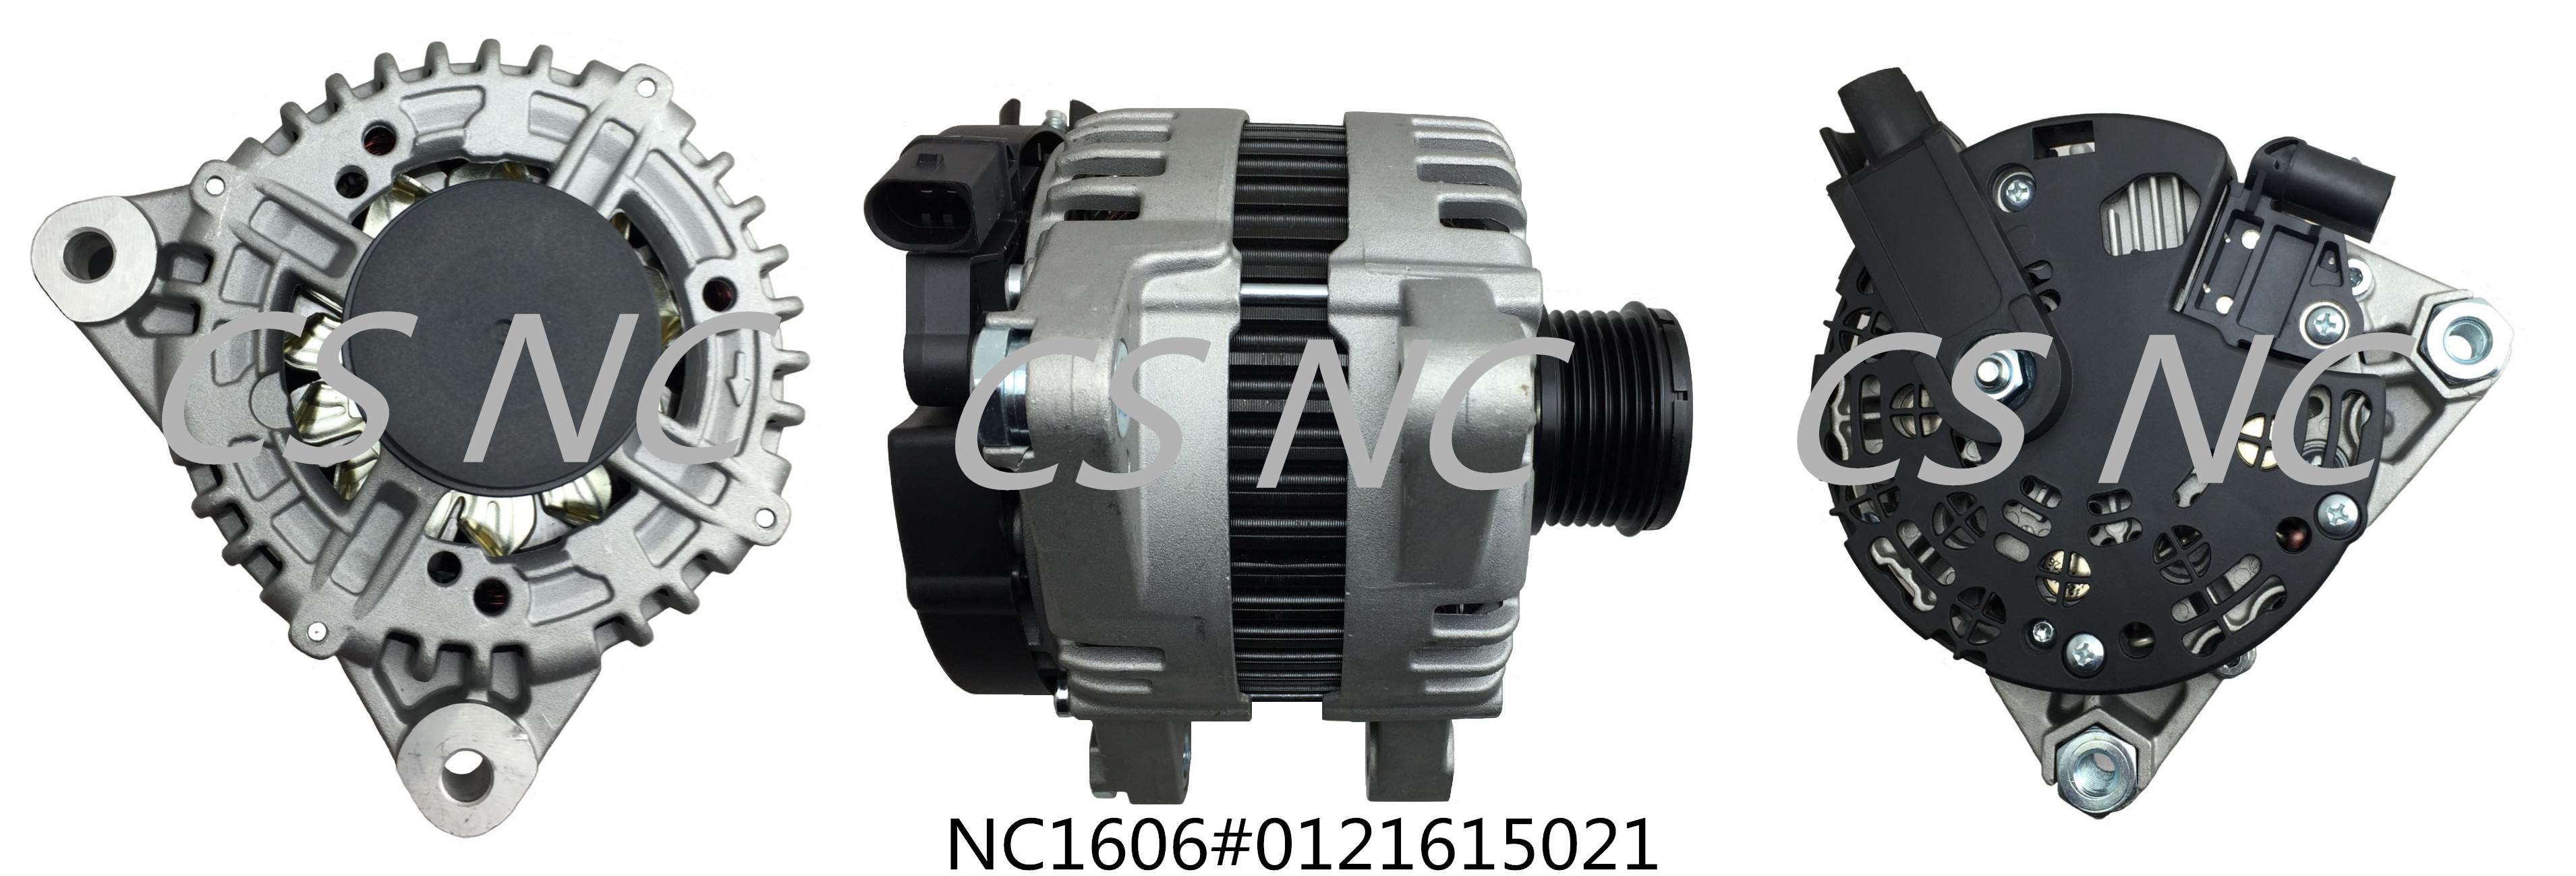 Alternator Generator NC1606 ( 12V 150A 0121615021)